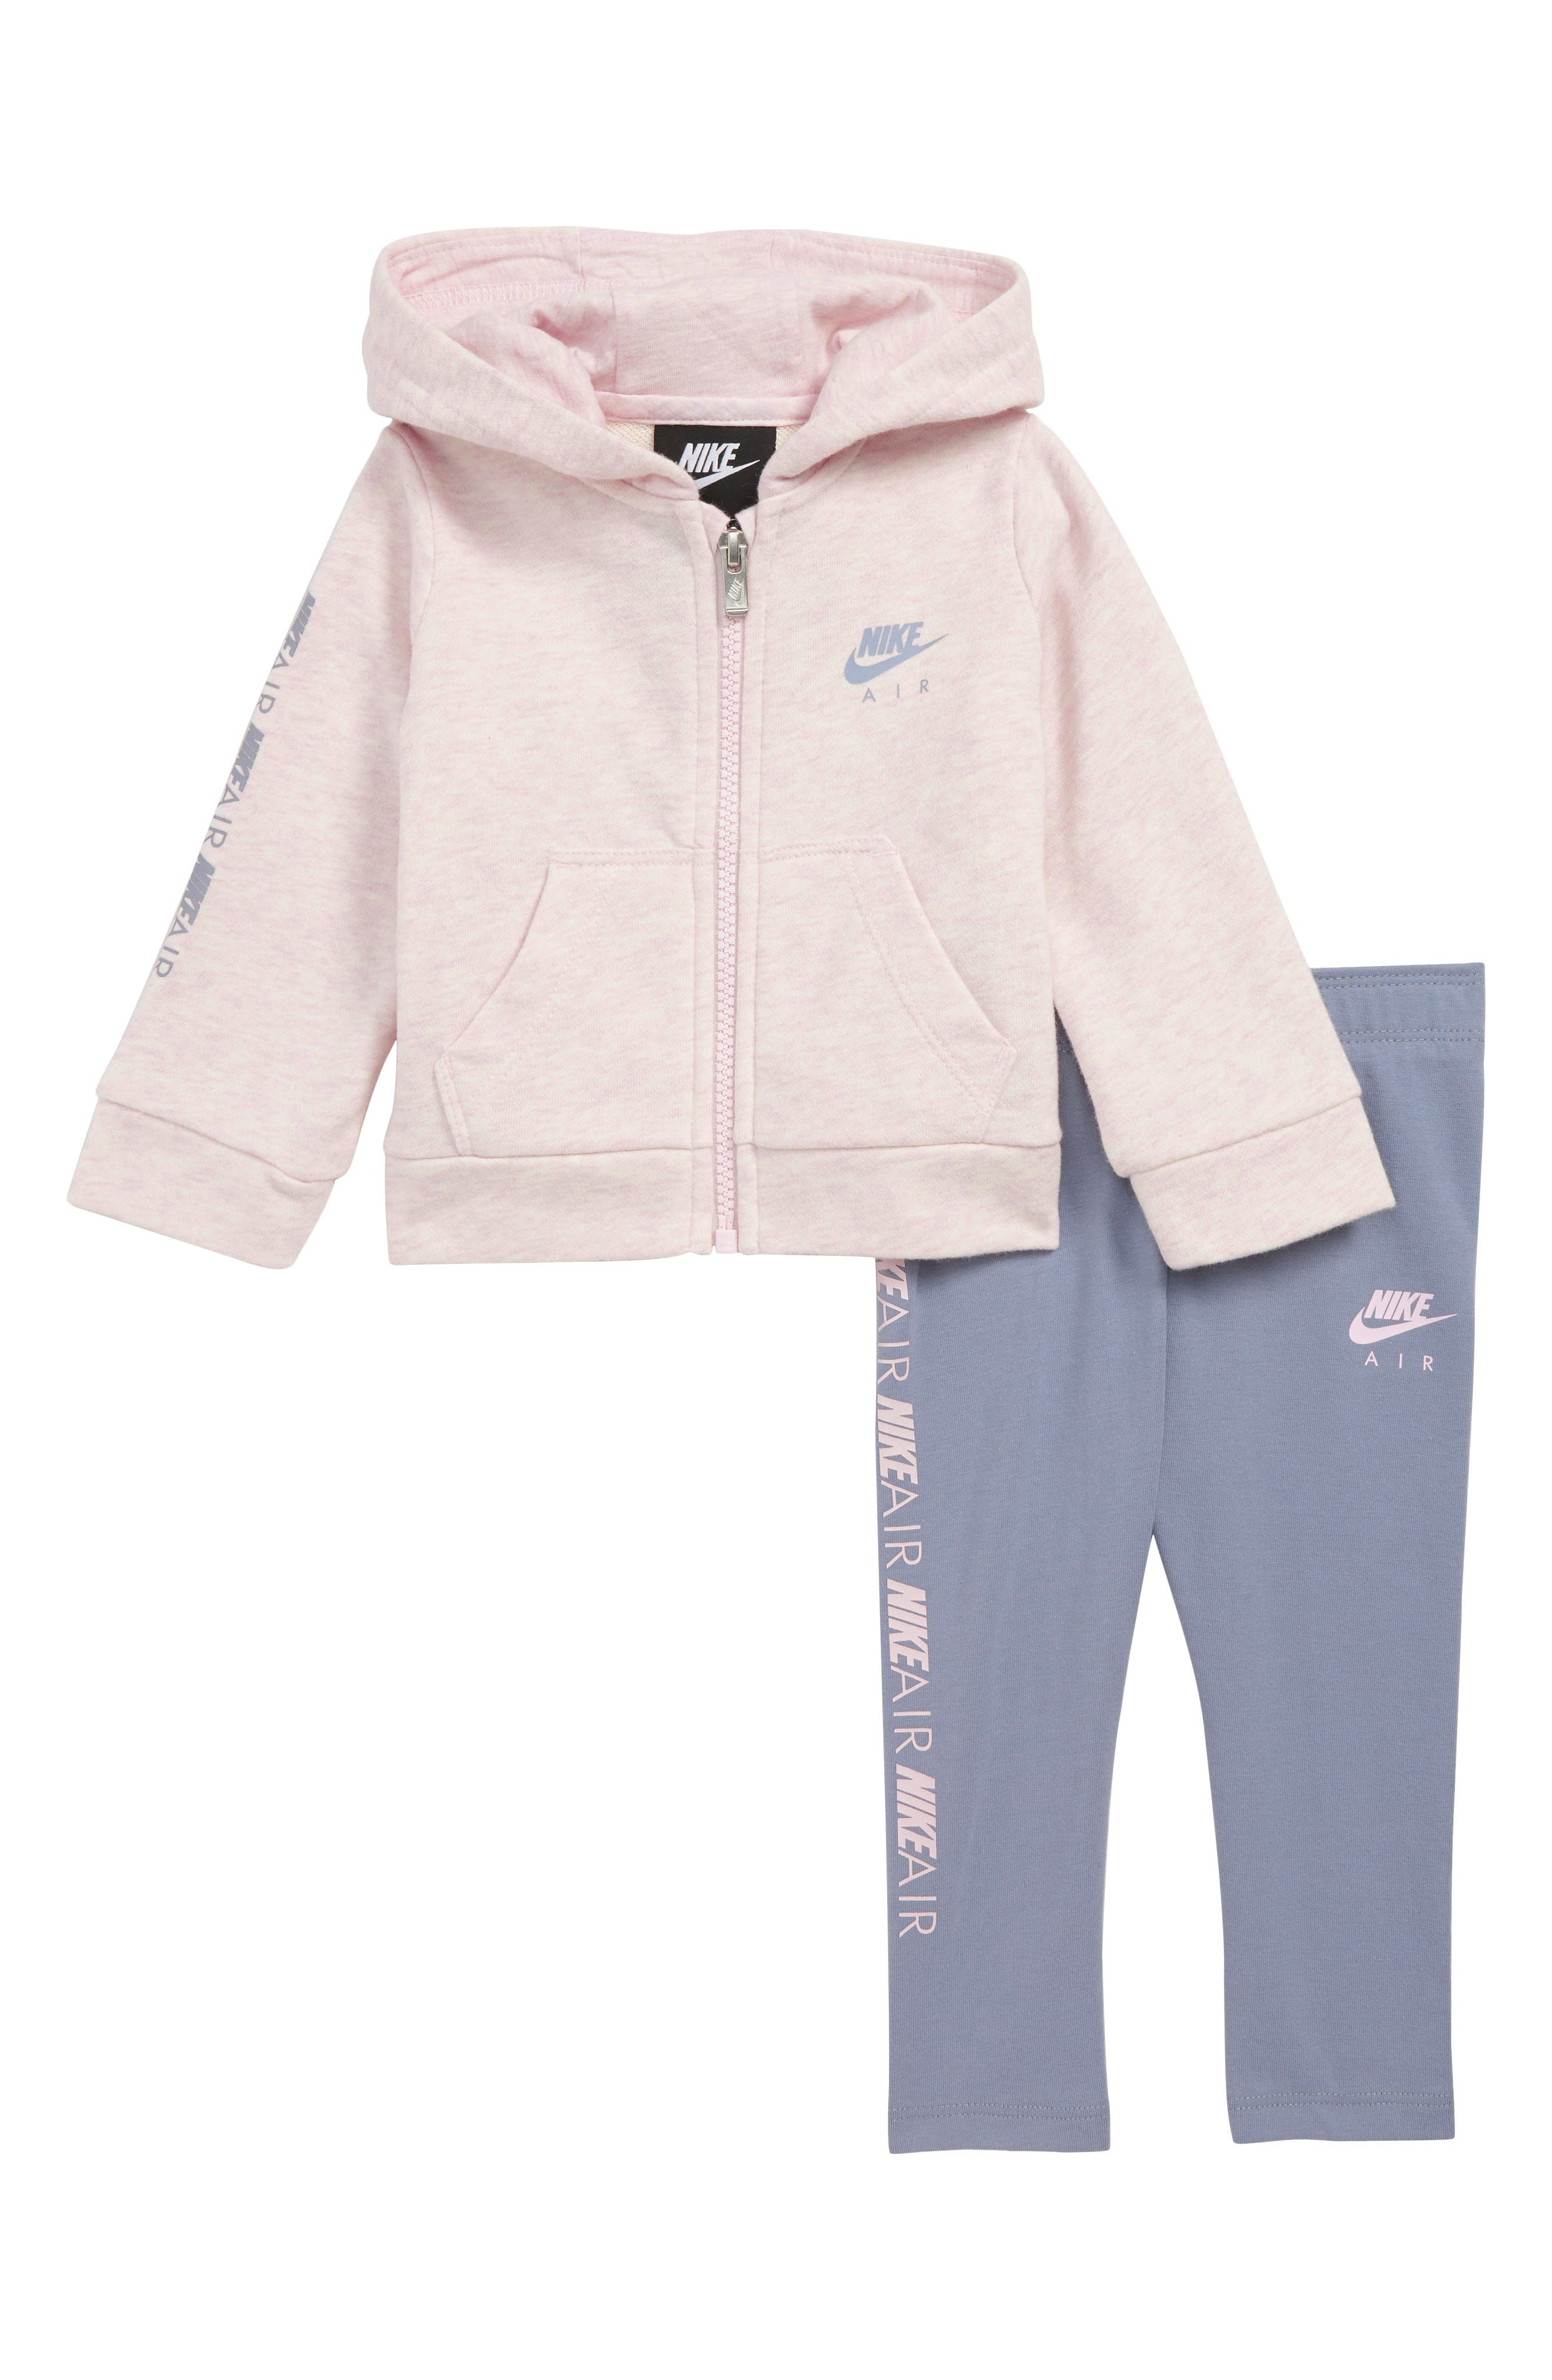 Air Zip Hoodie & Pants Set, Main, color, ASHEN SLATE